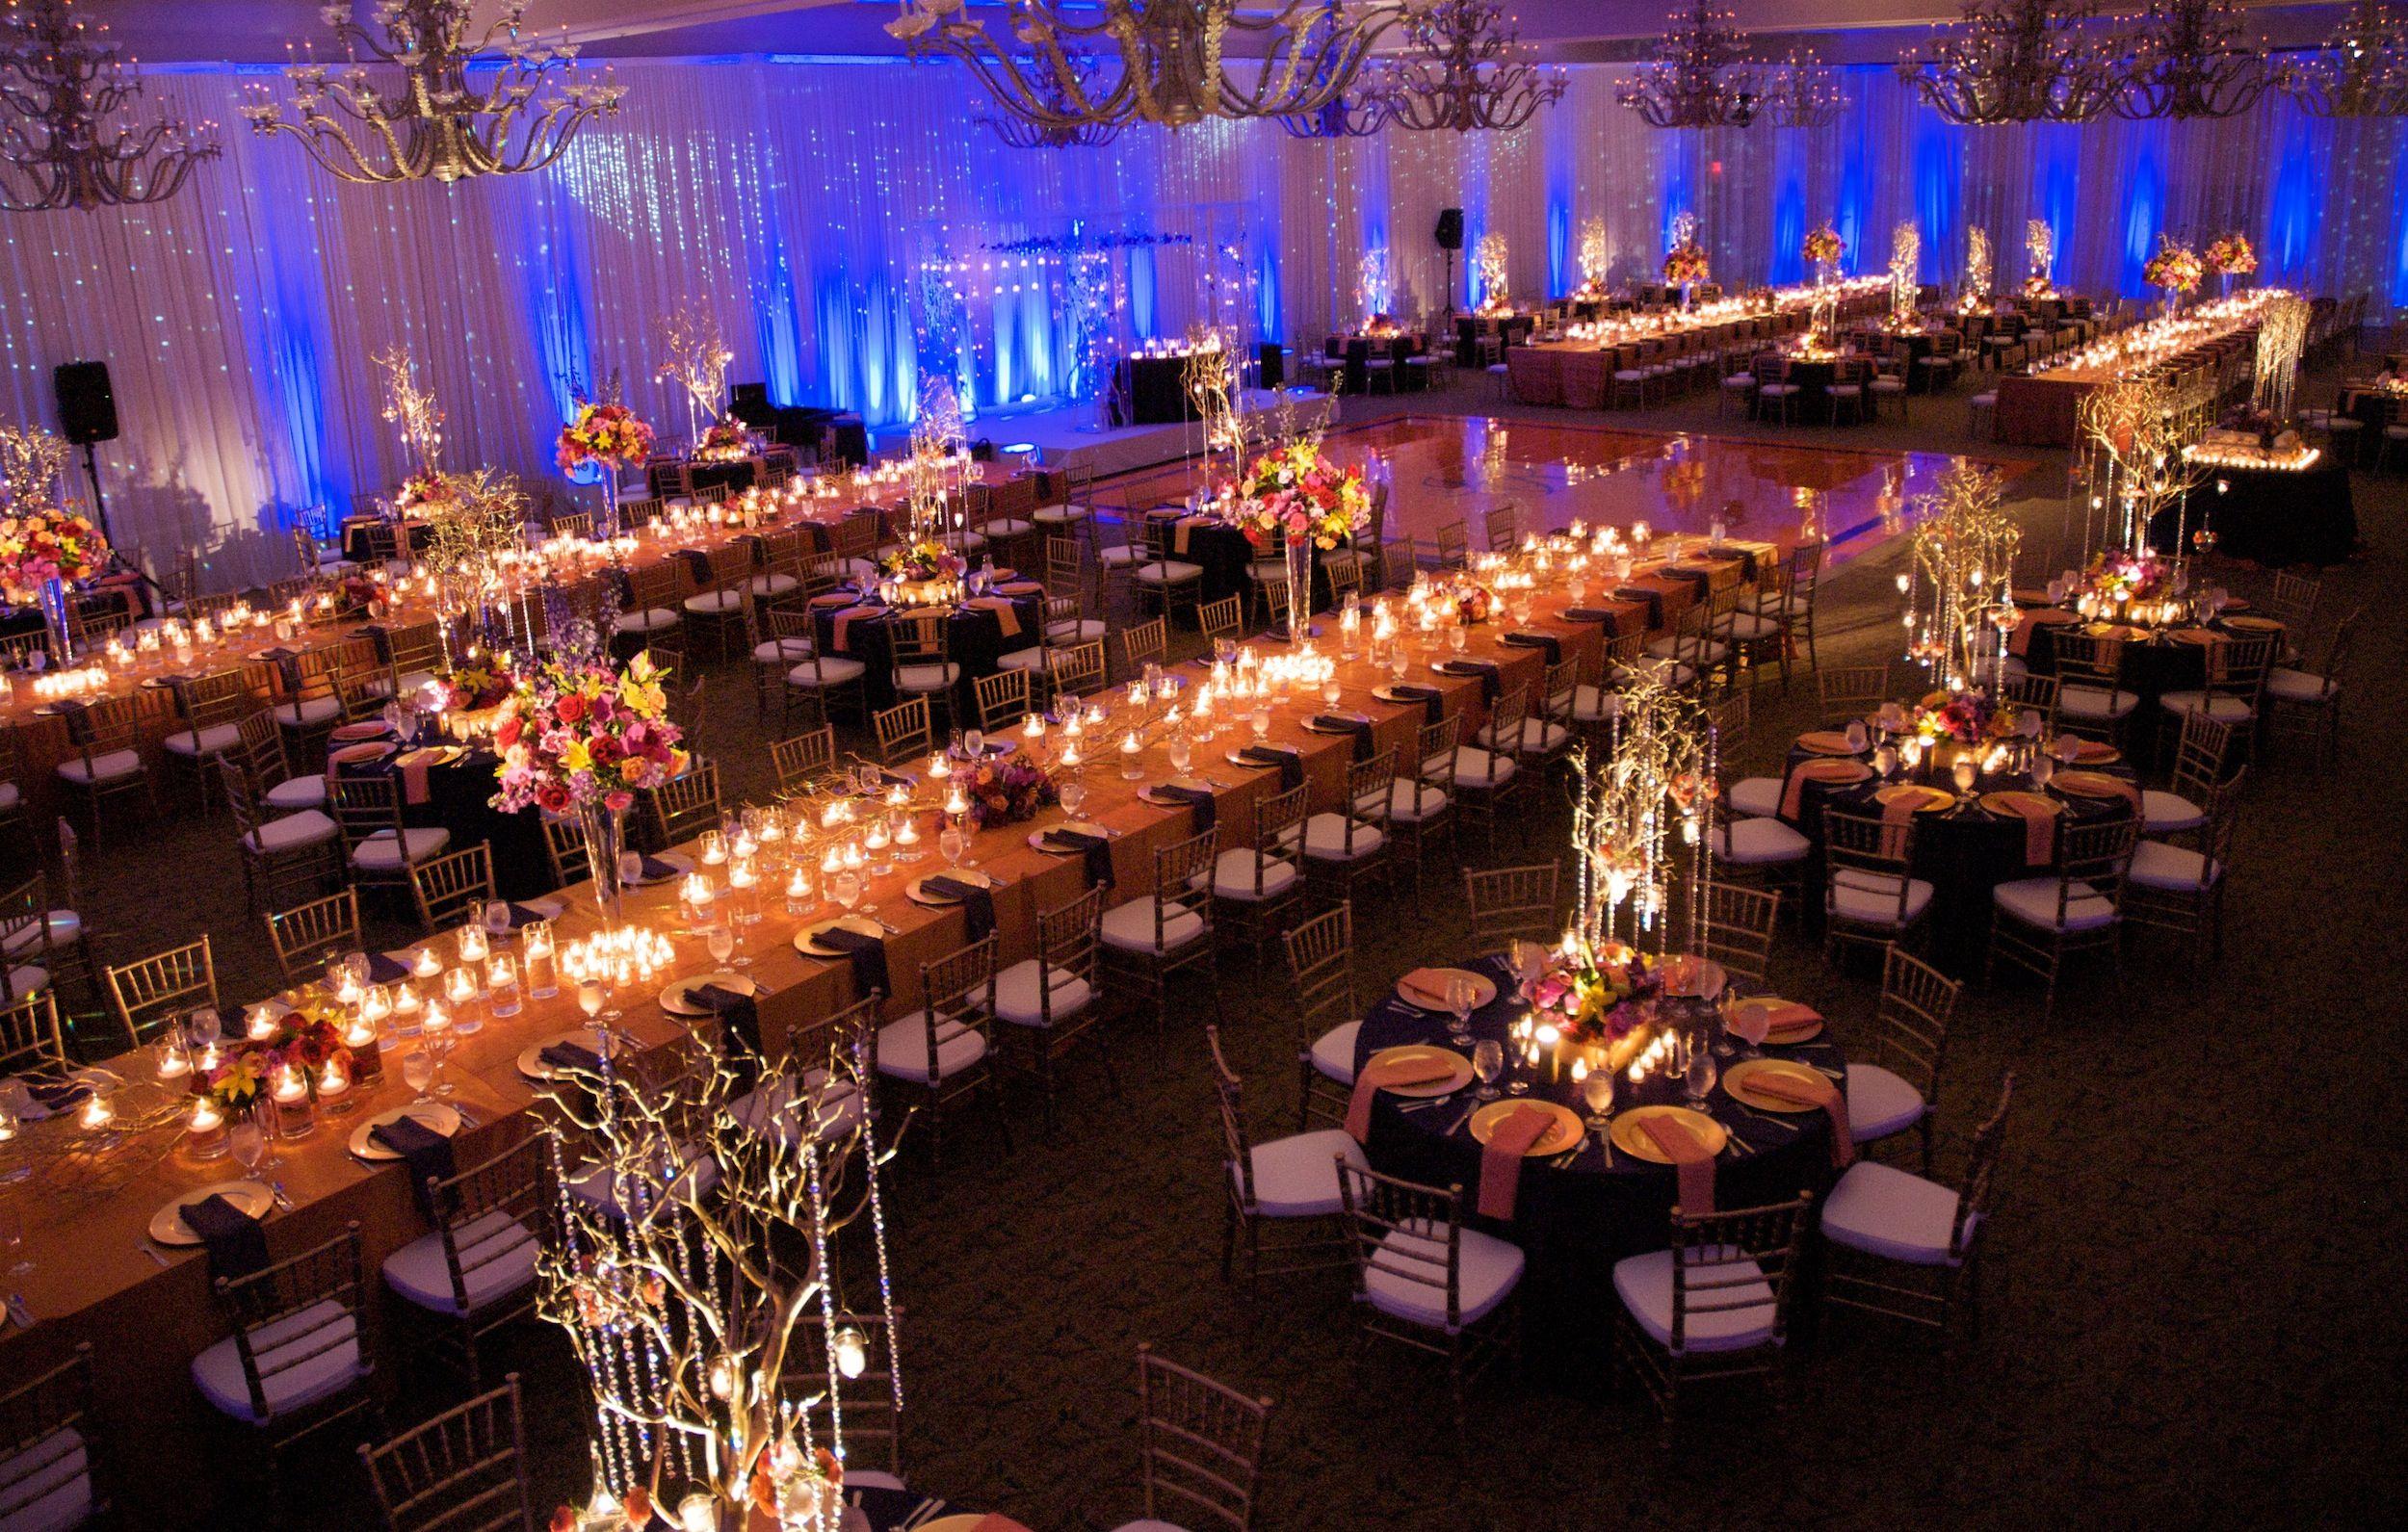 wedding receptions sacramento ca%0A Reception in a Gaylord Hotel ballroom   PROM        Pinterest   Ballrooms  and Reception